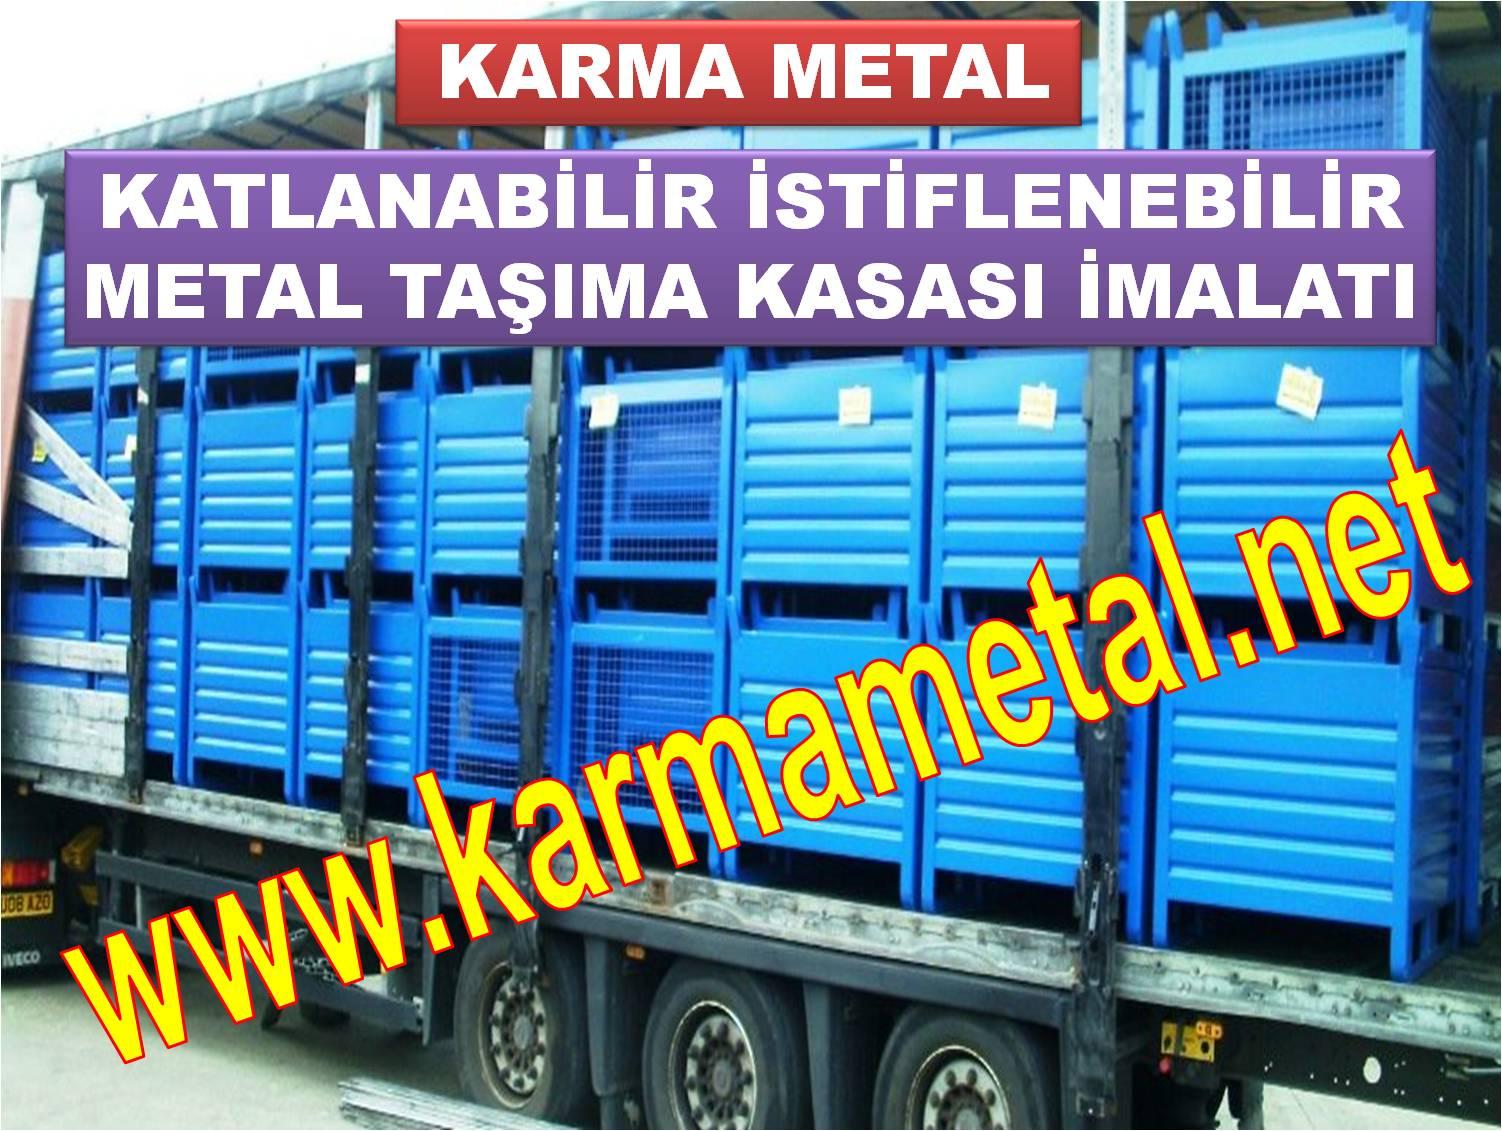 katlanabilir_istiflenebilir_metal_tasima_kasasi_sevkiyat_kasalari_istanbul (5)